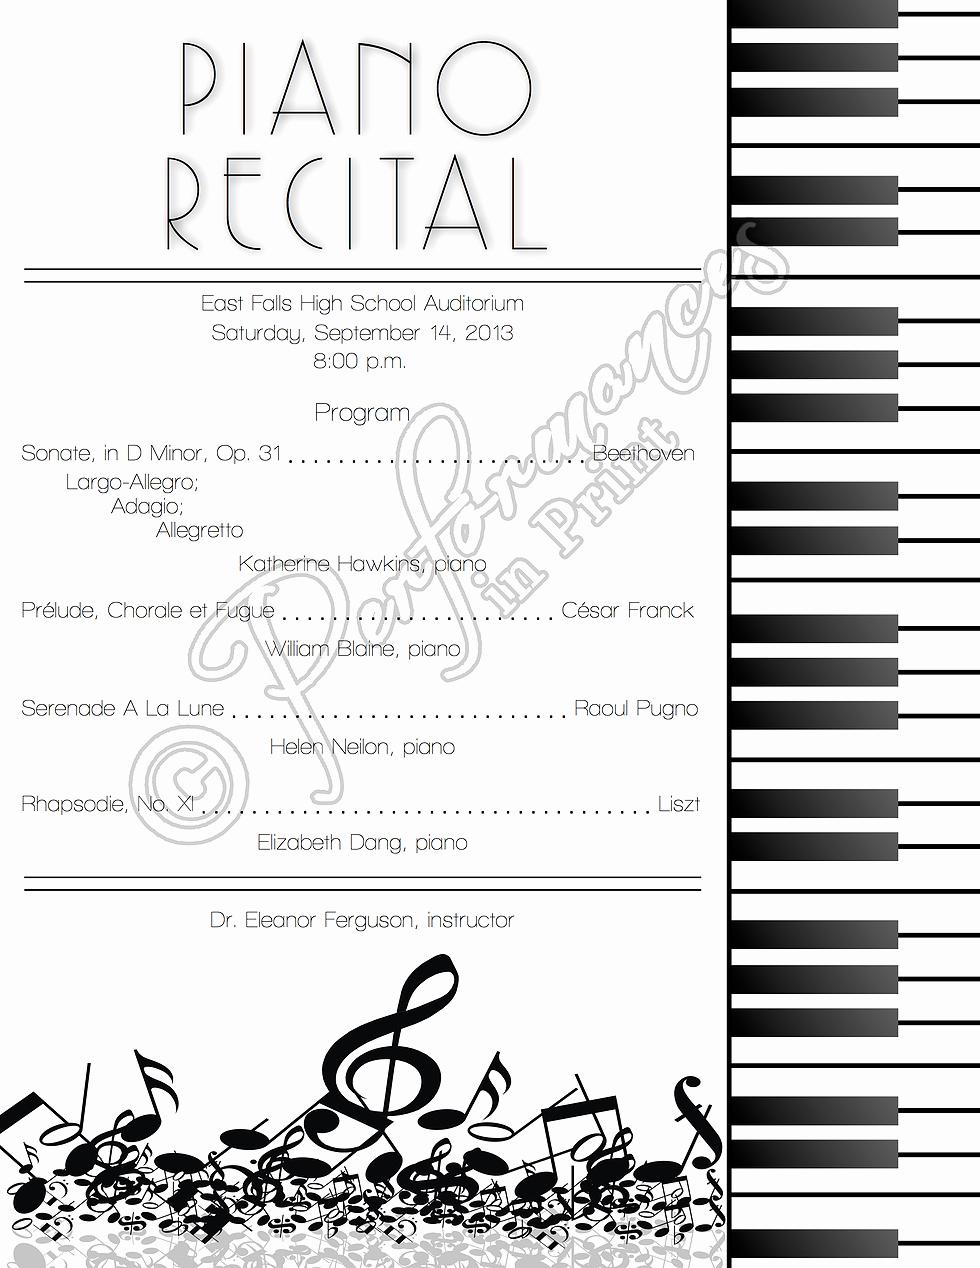 Music Recital Program Templates Free Beautiful Piano Recital Concert Music Program